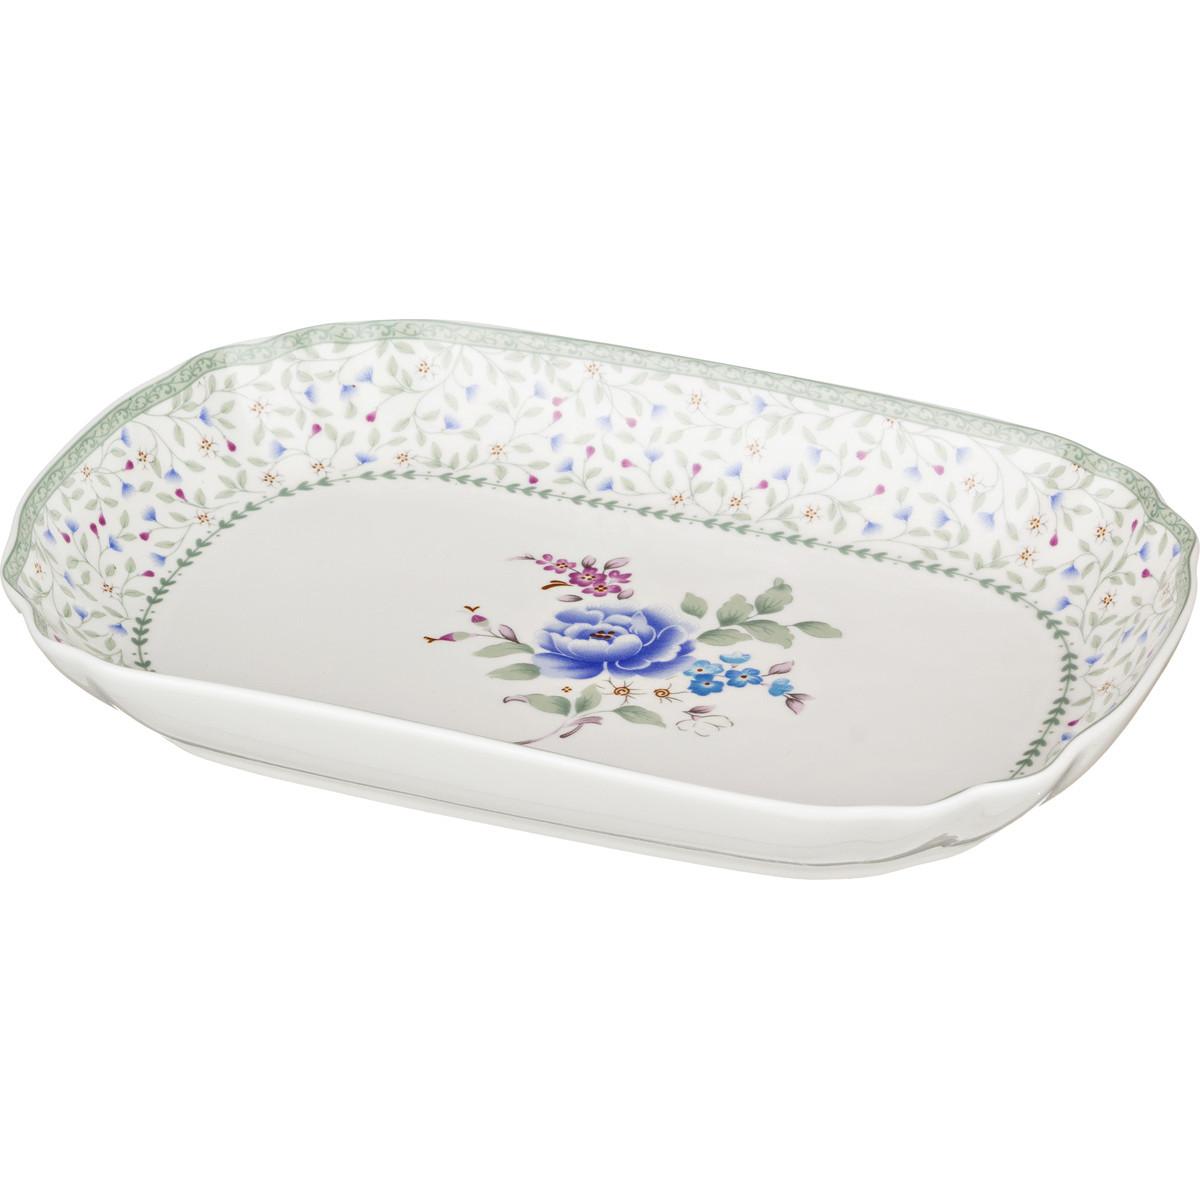 {} Lefard Блюдо-шубница Densita (17х25 см) блюдо шубница корейская роза 29 18 5 см